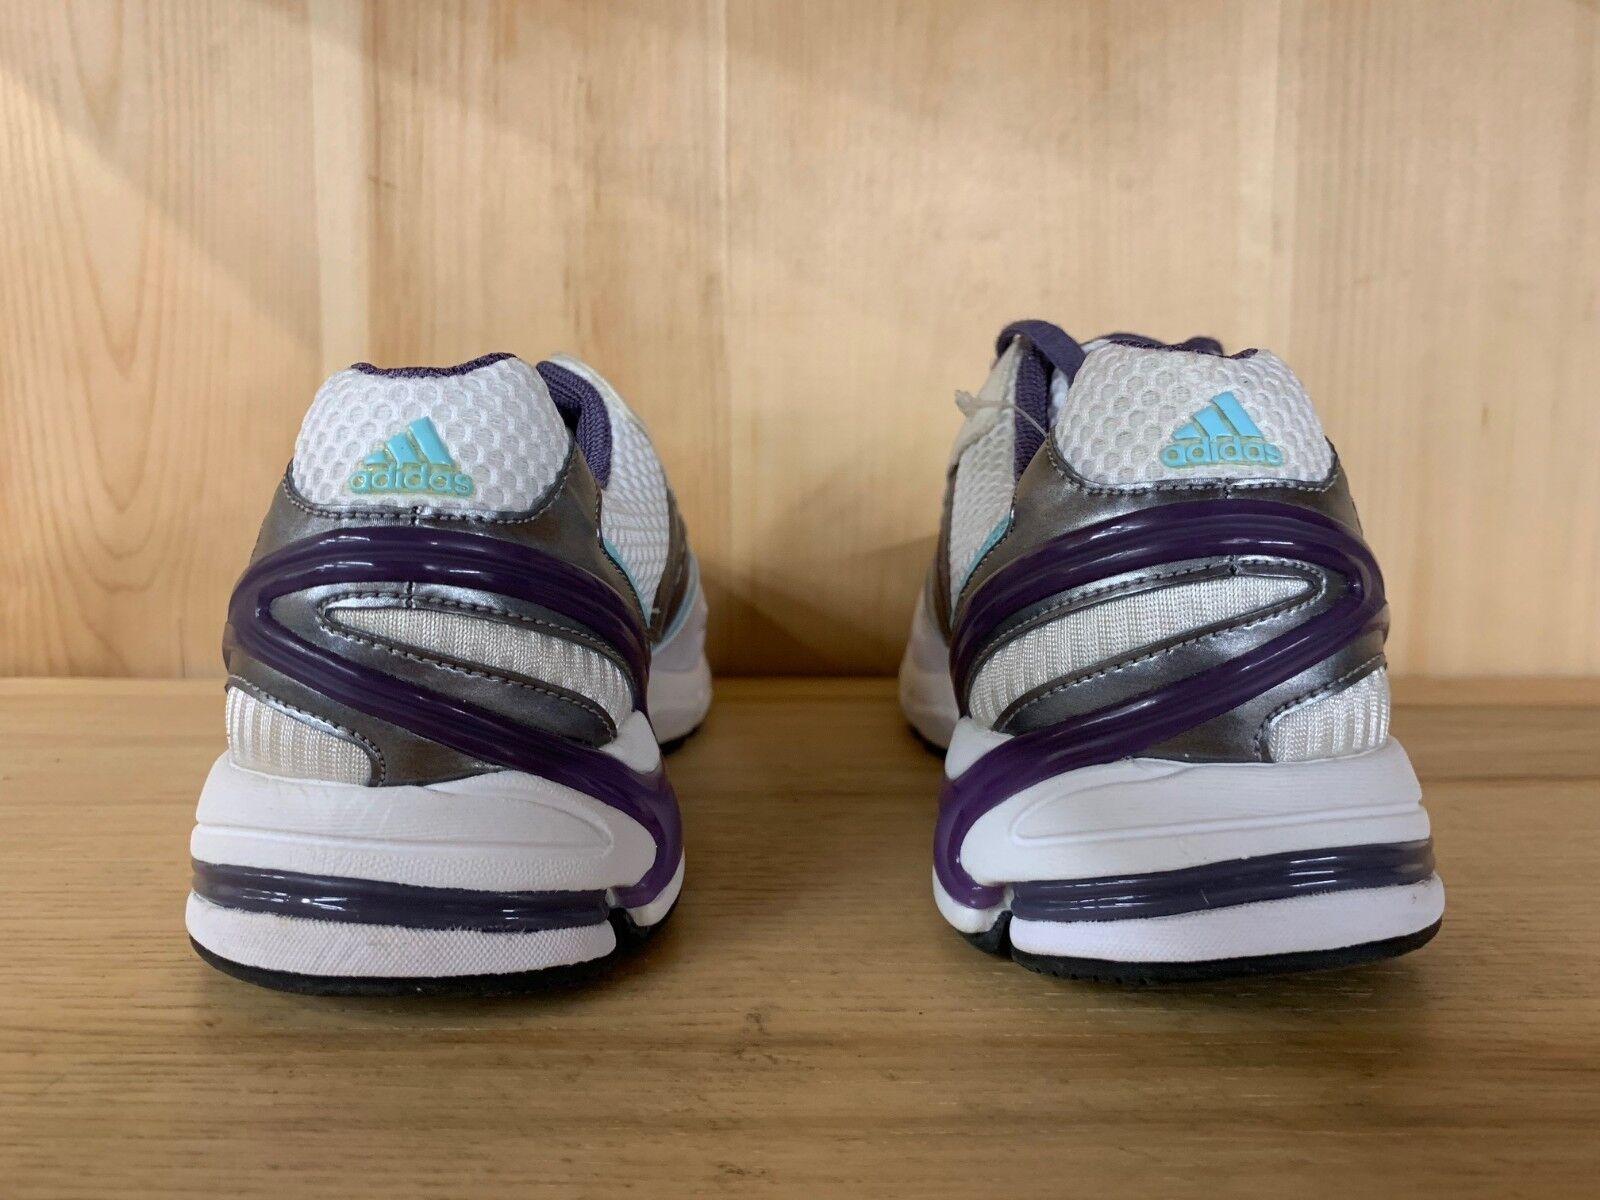 Adidas zx 8000 sp bianco viola in donne wmns wmns wmns sz 9 - 12 g04889   Grande Svendita    Maschio/Ragazze Scarpa  2aec63